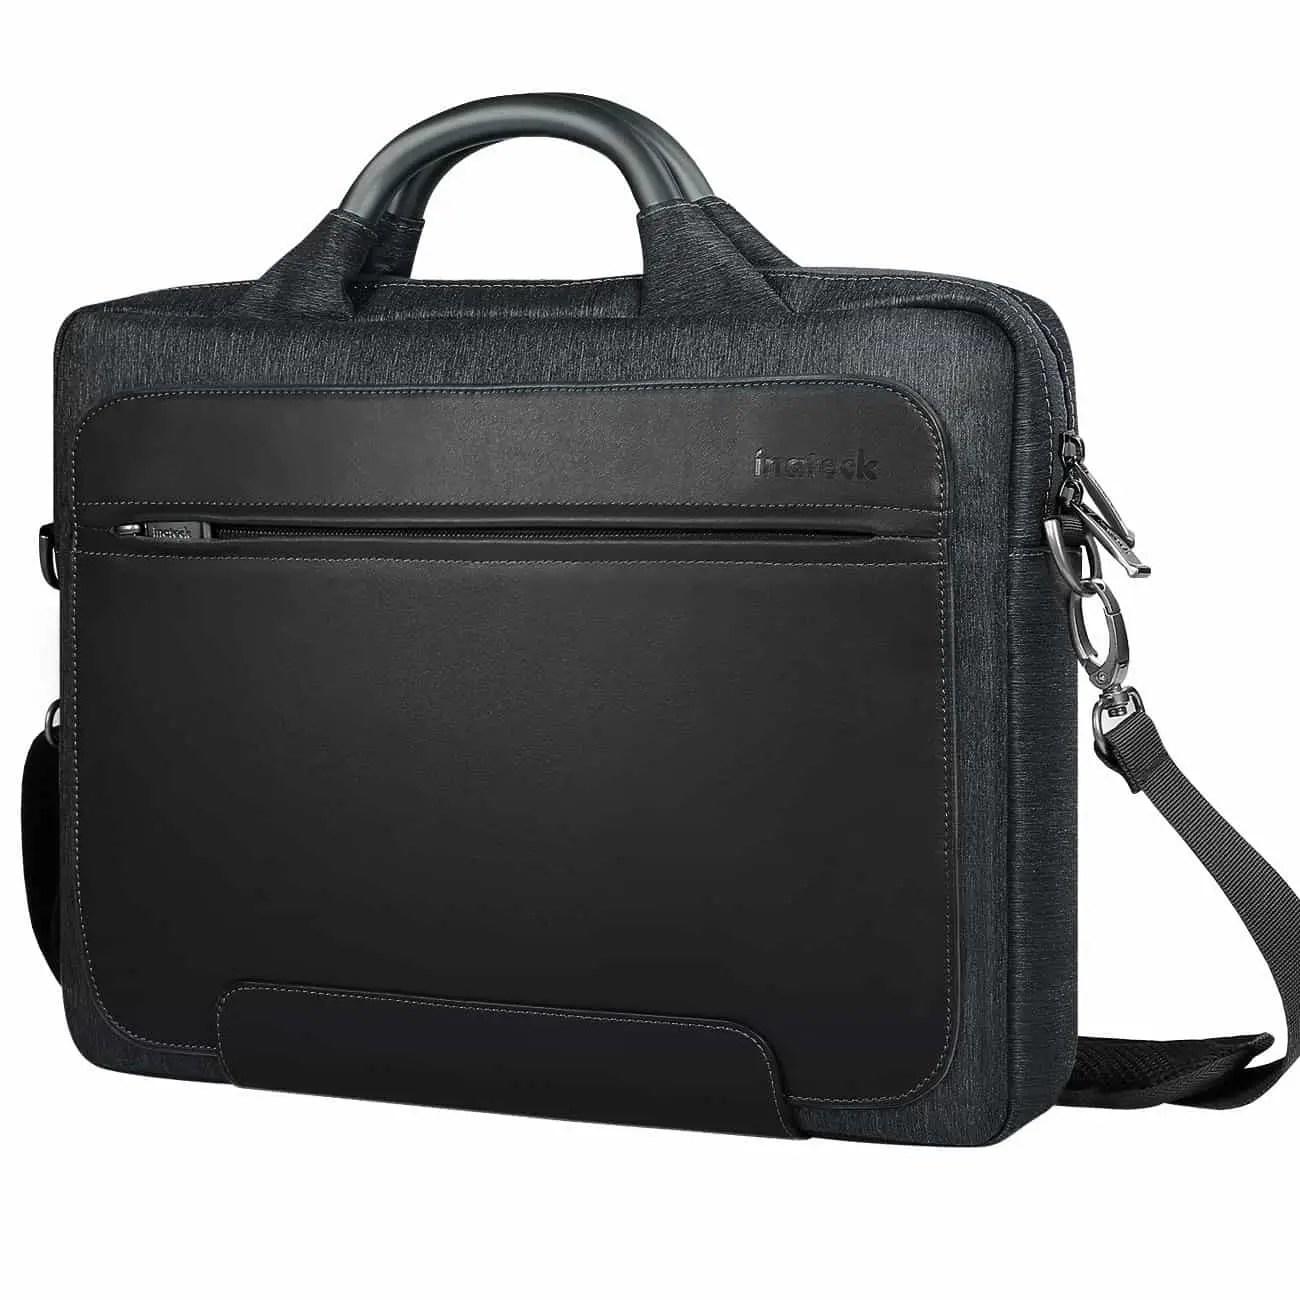 Inateck LB1406 Laptop Shoulder Bag Review